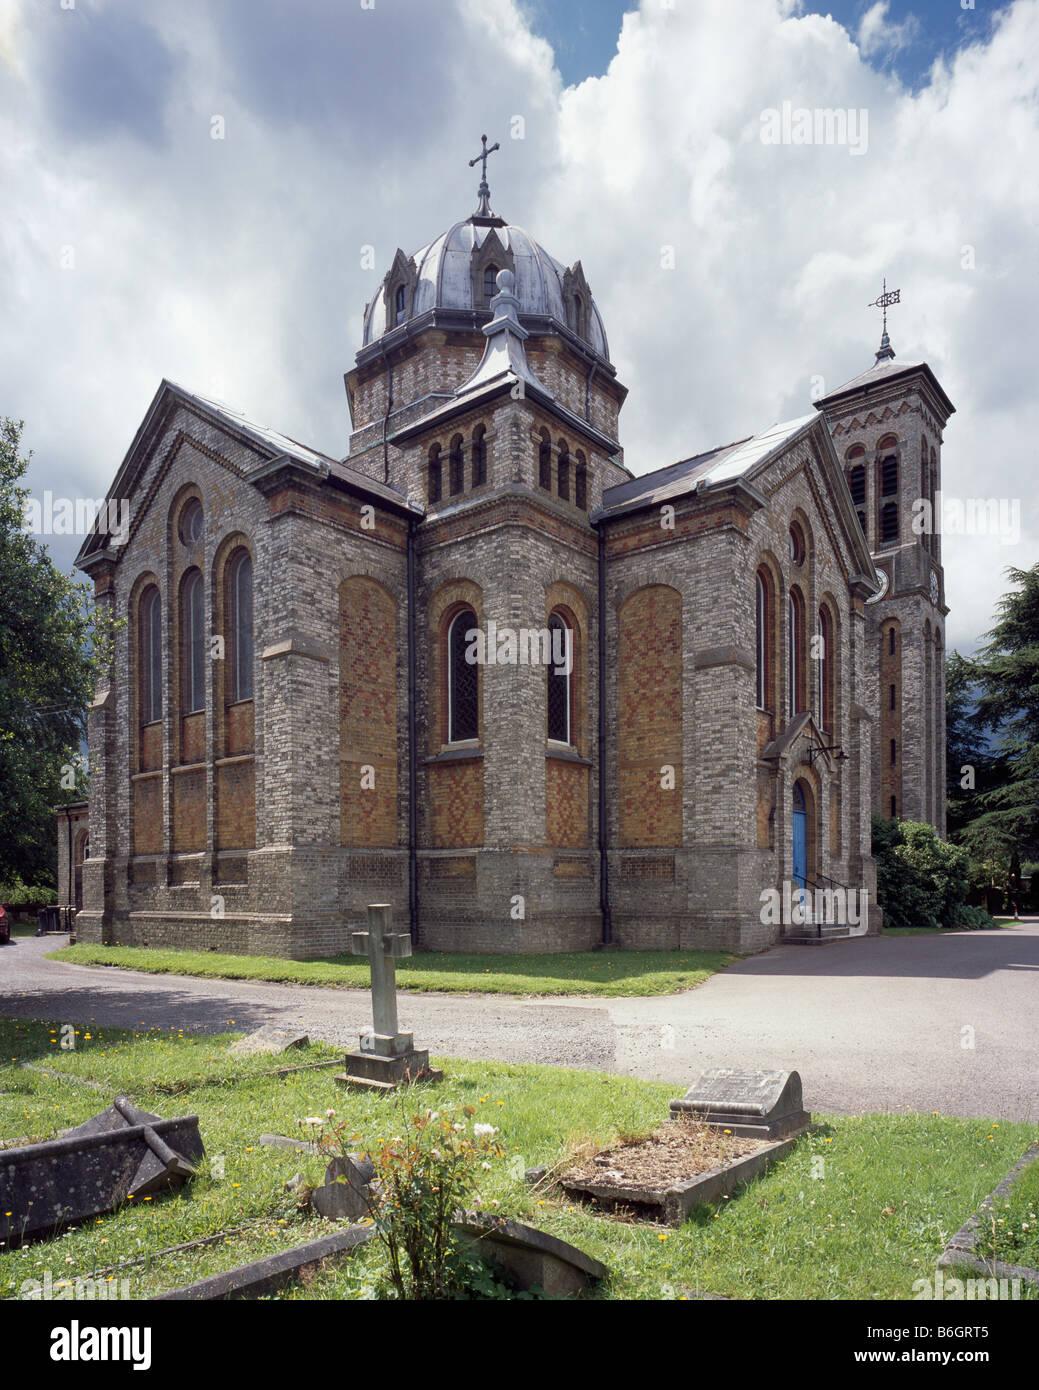 Saint James's, Gerrard's Cross - Stock Image